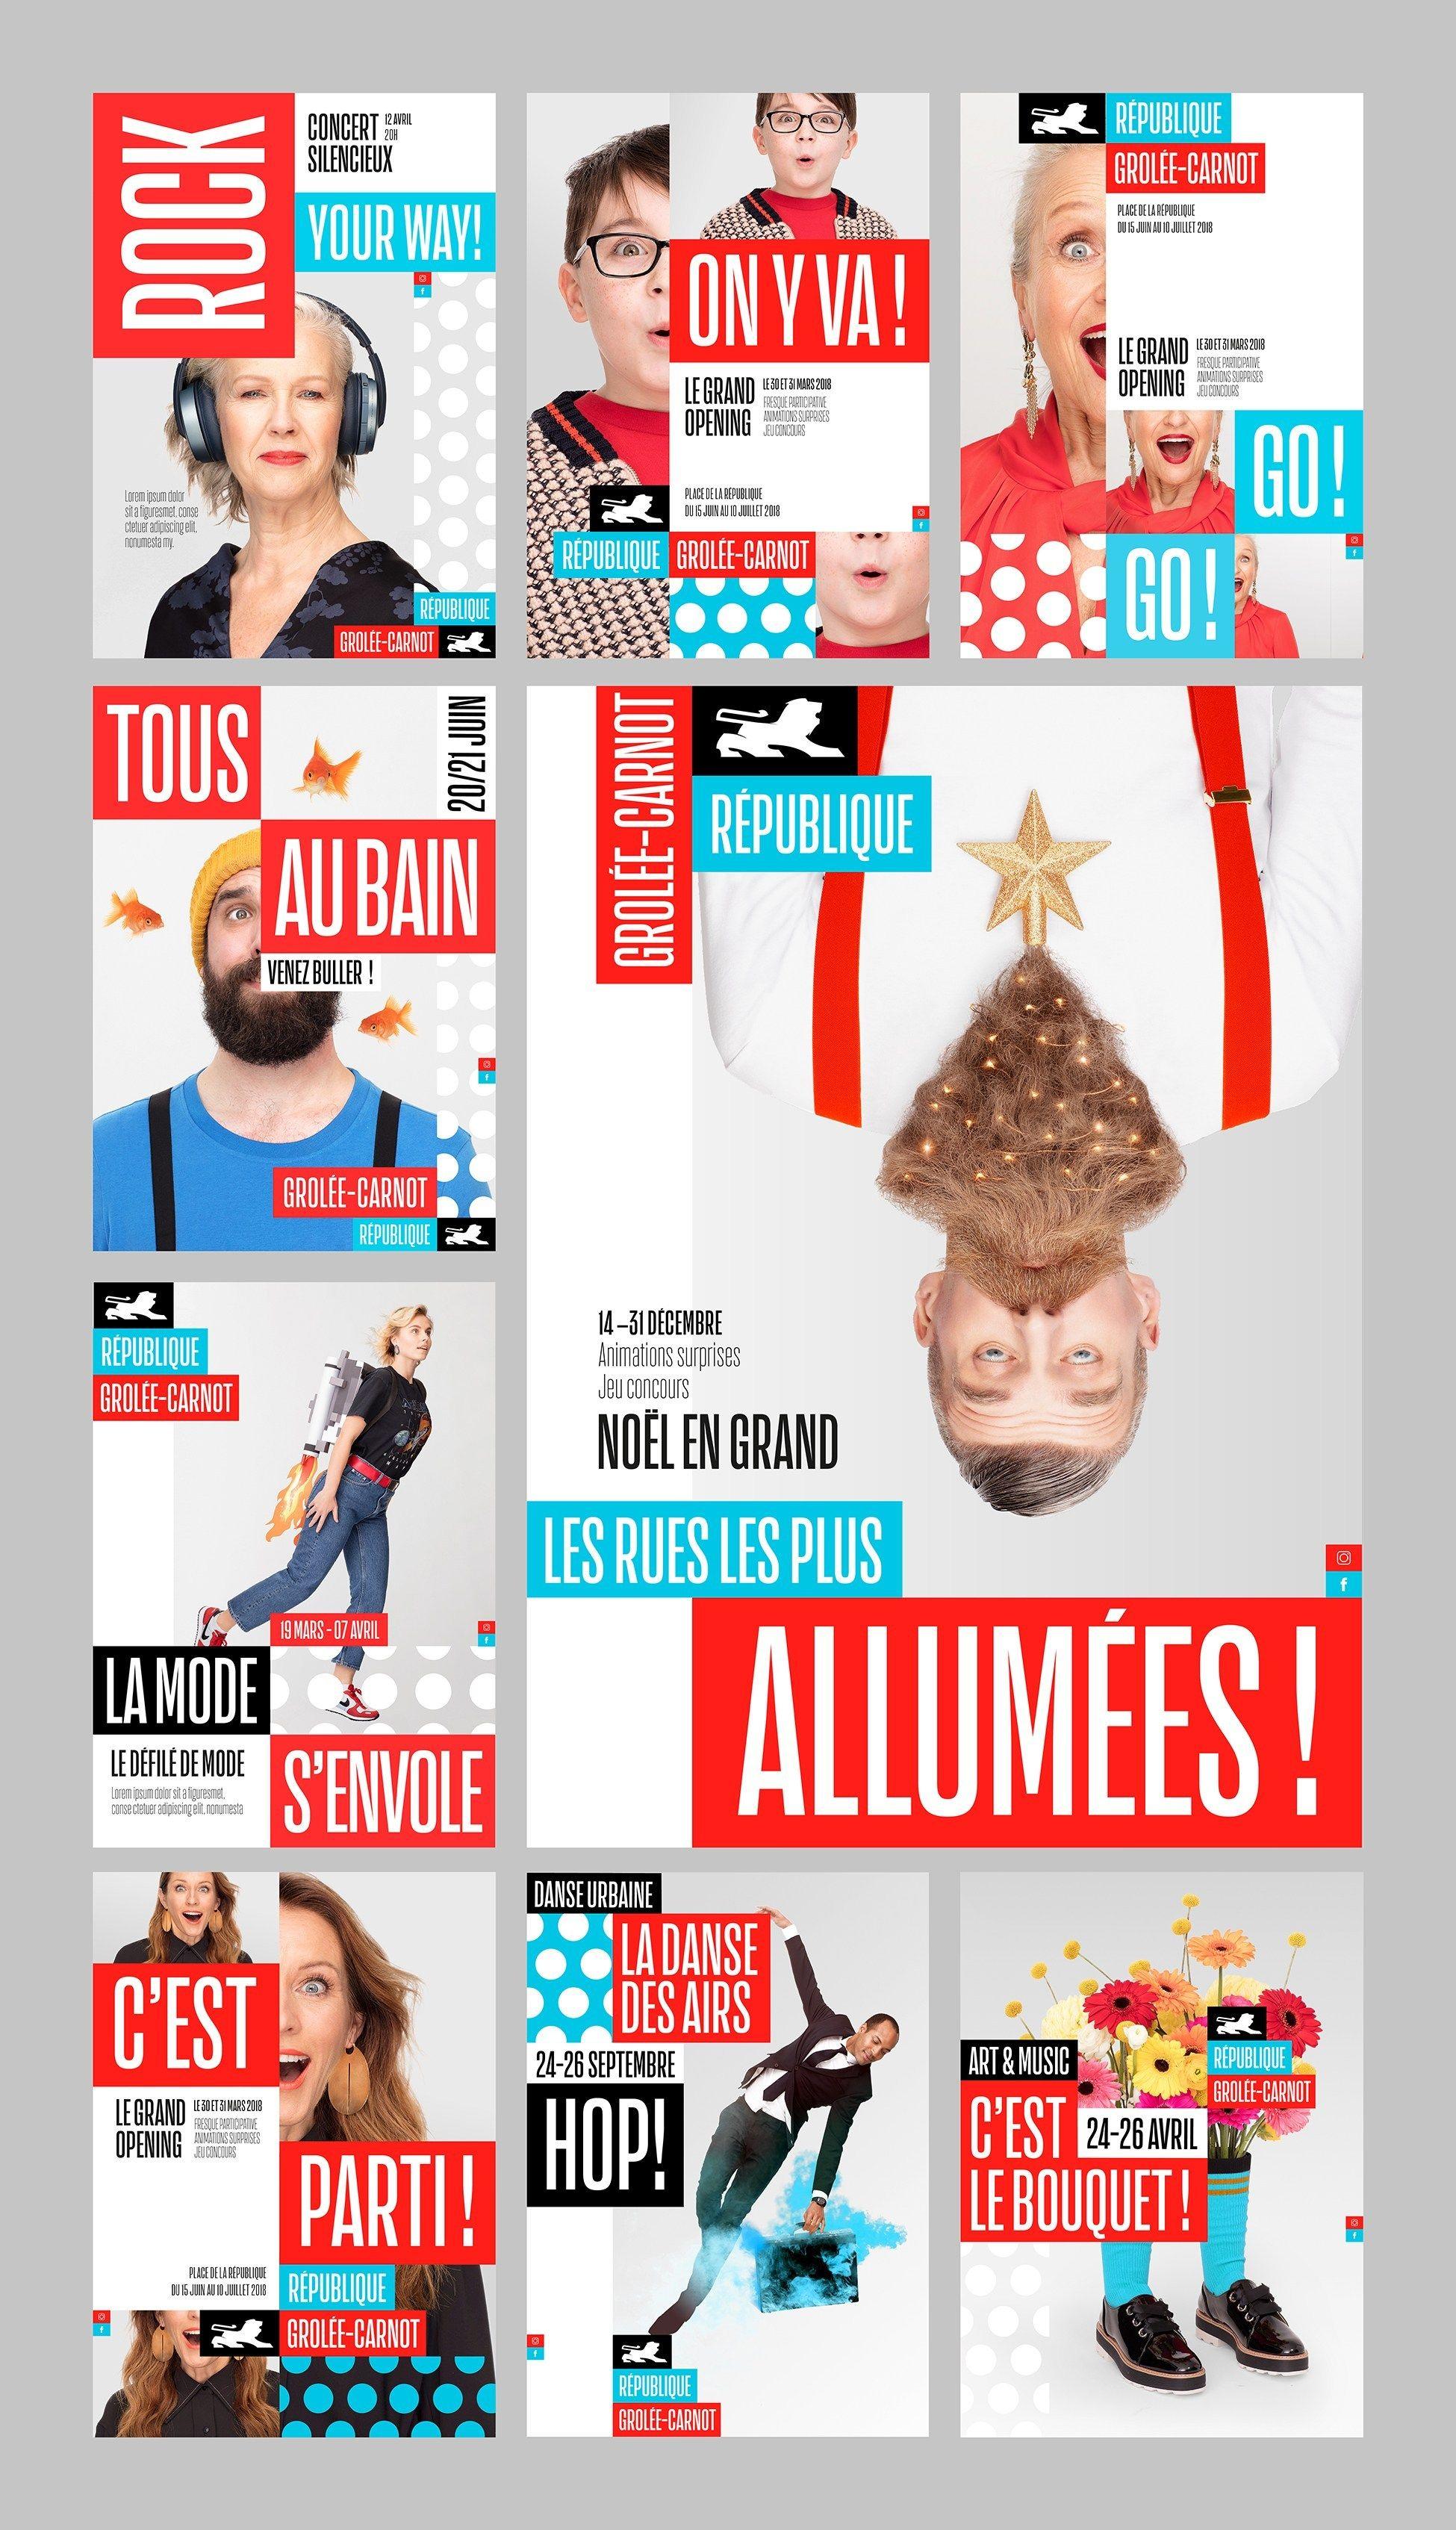 Advertising-Infographics-Republique-Grolee-Carnot-Identite-visuelle Advertising Infographics : République - Grolée-Carnot - Identitévisuelle